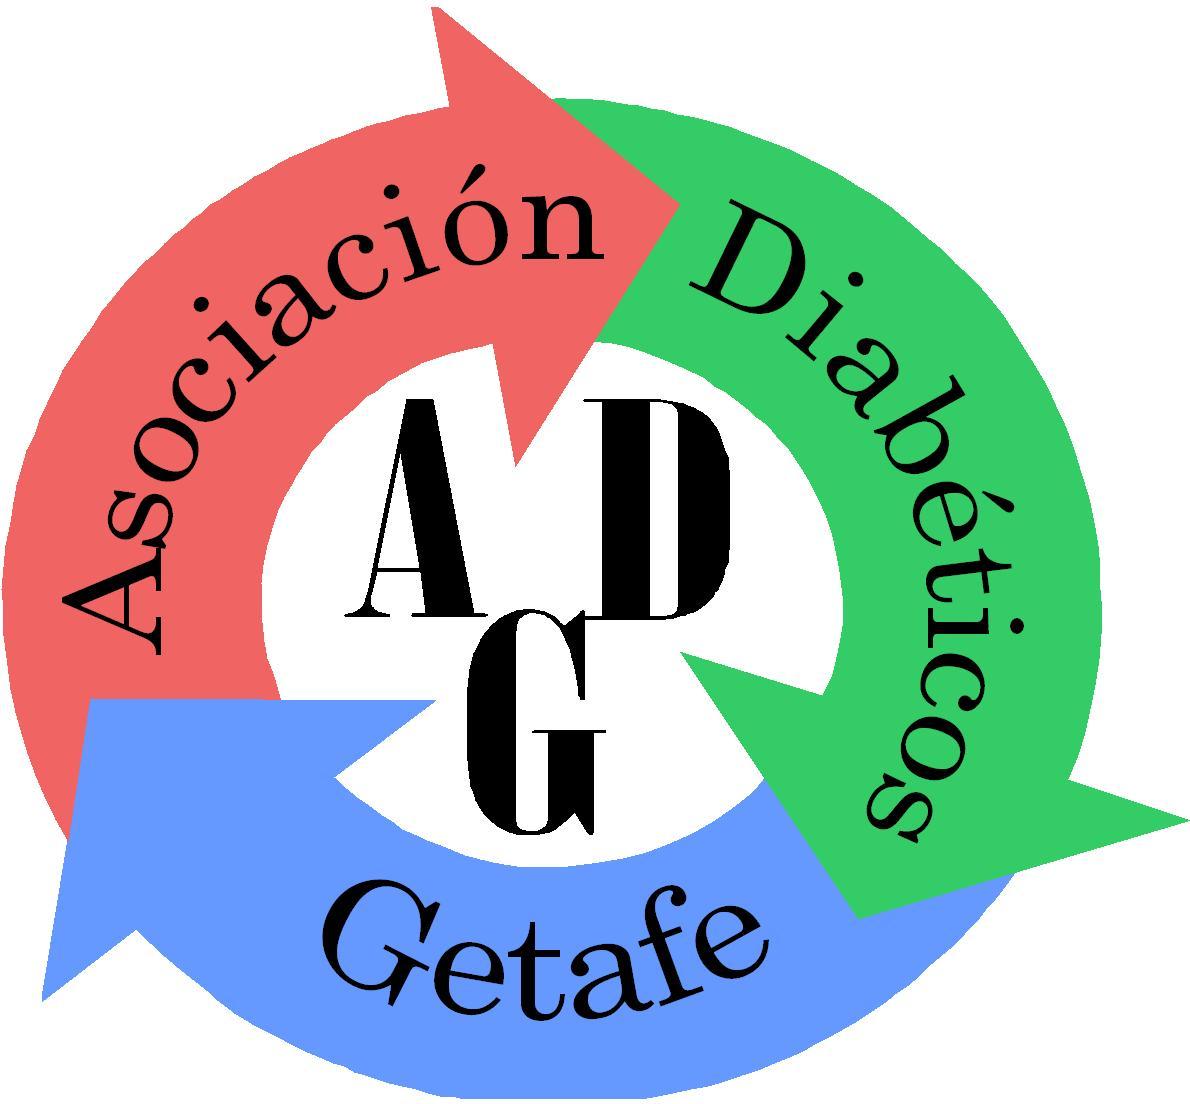 VIII Semana de la Diabetes en Getafe 2012